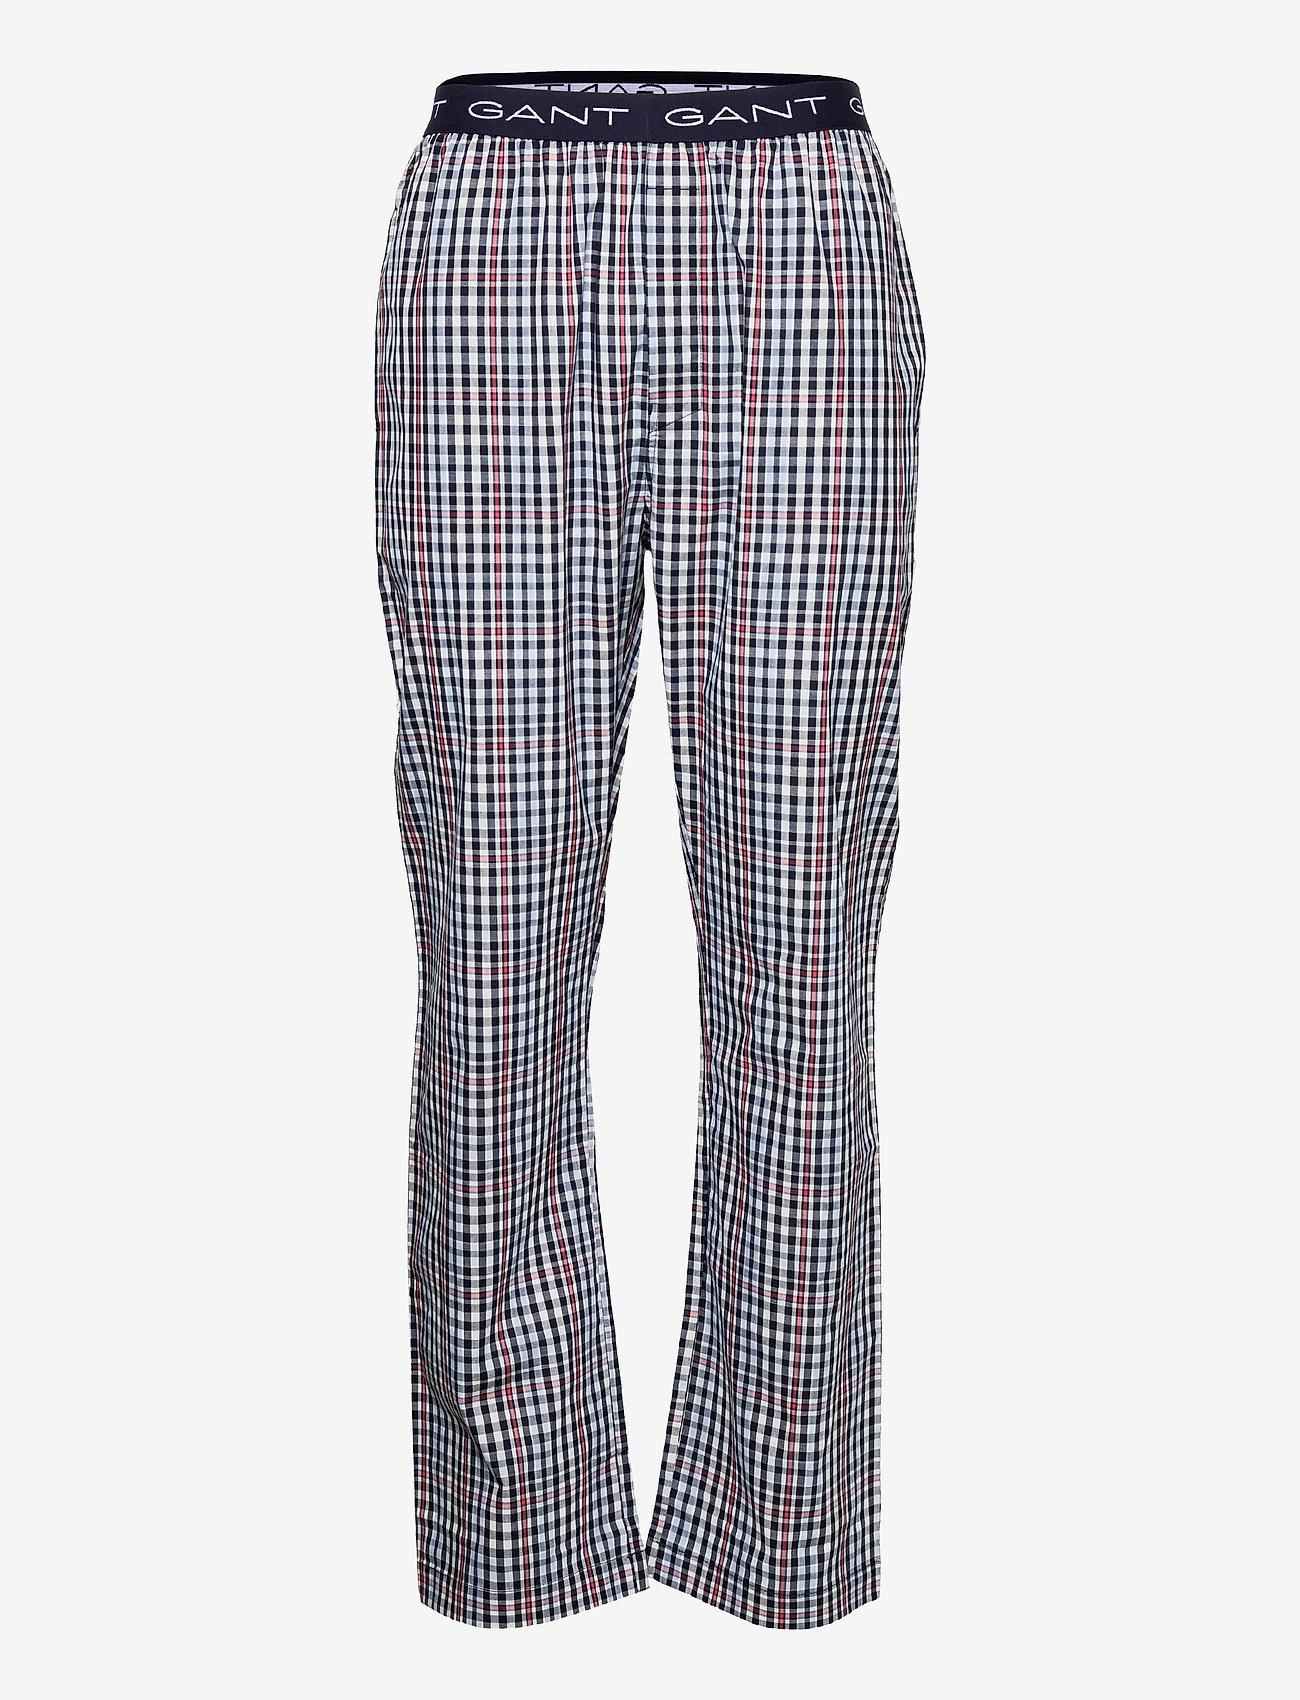 GANT - BIG CHECK PAJAMA PANTS - bottoms - classic blue - 0